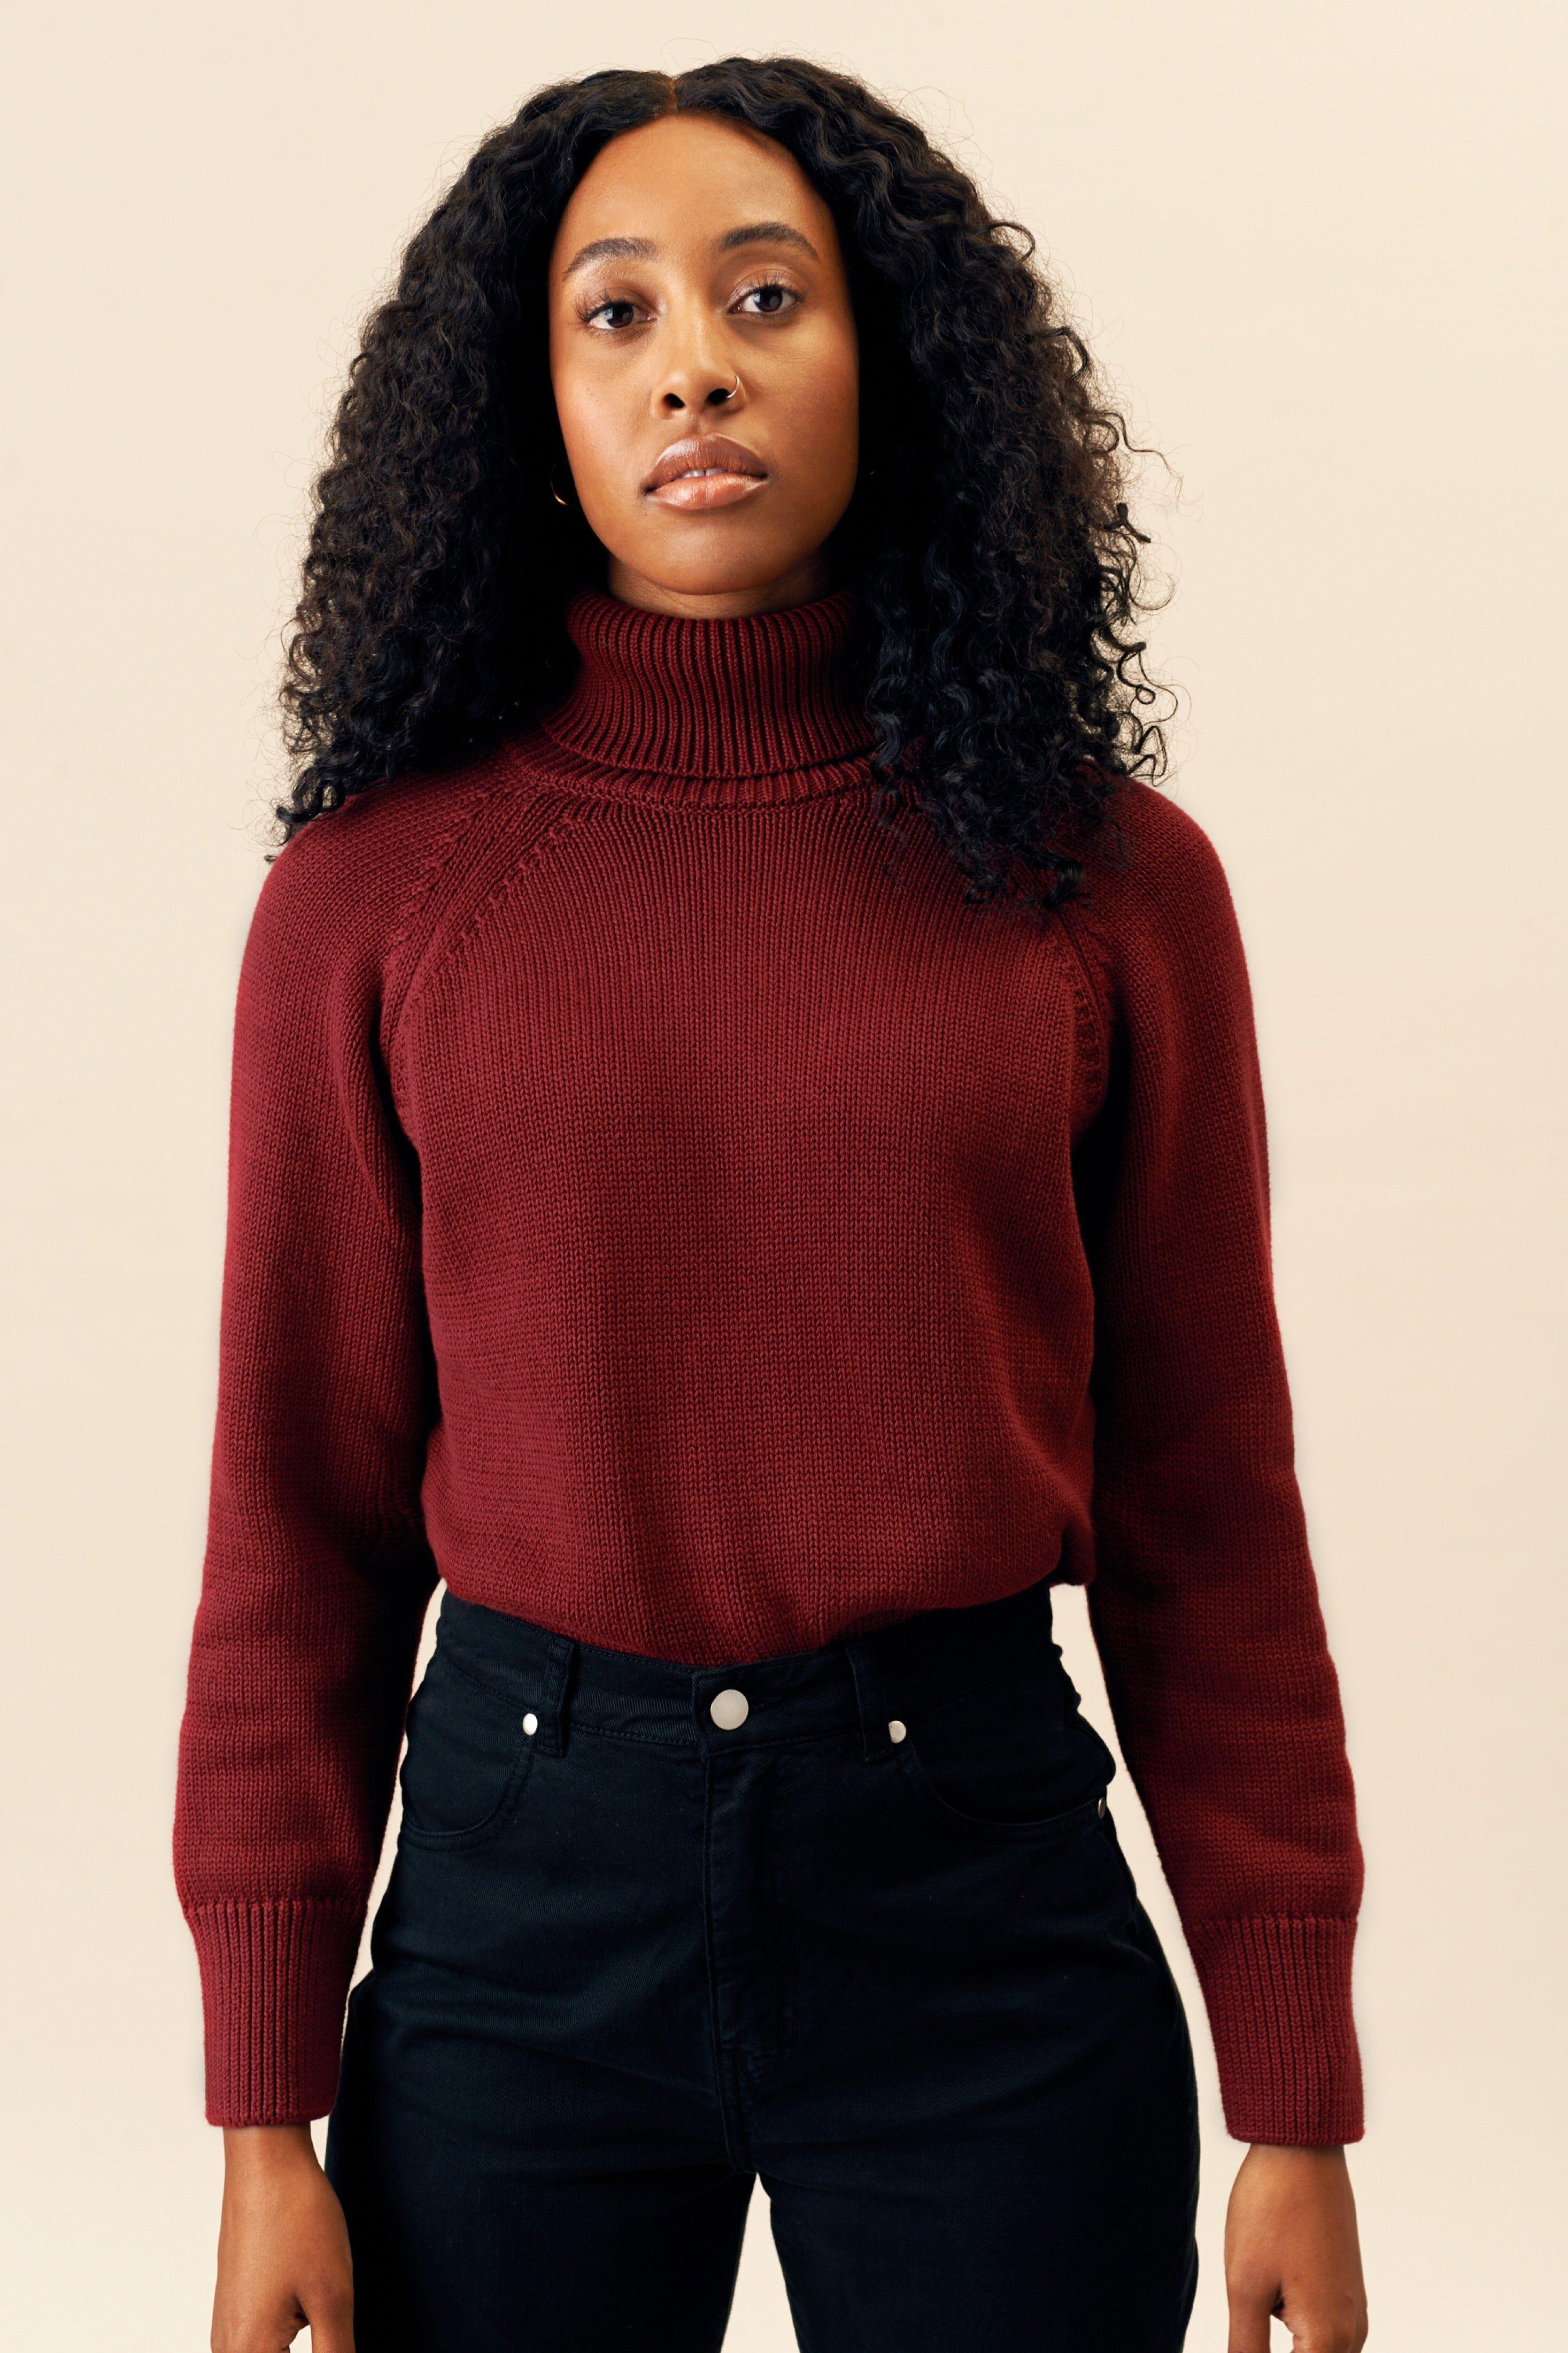 Kotn Women's Turtleneck Top Sweater in Merlot Red, Size XS